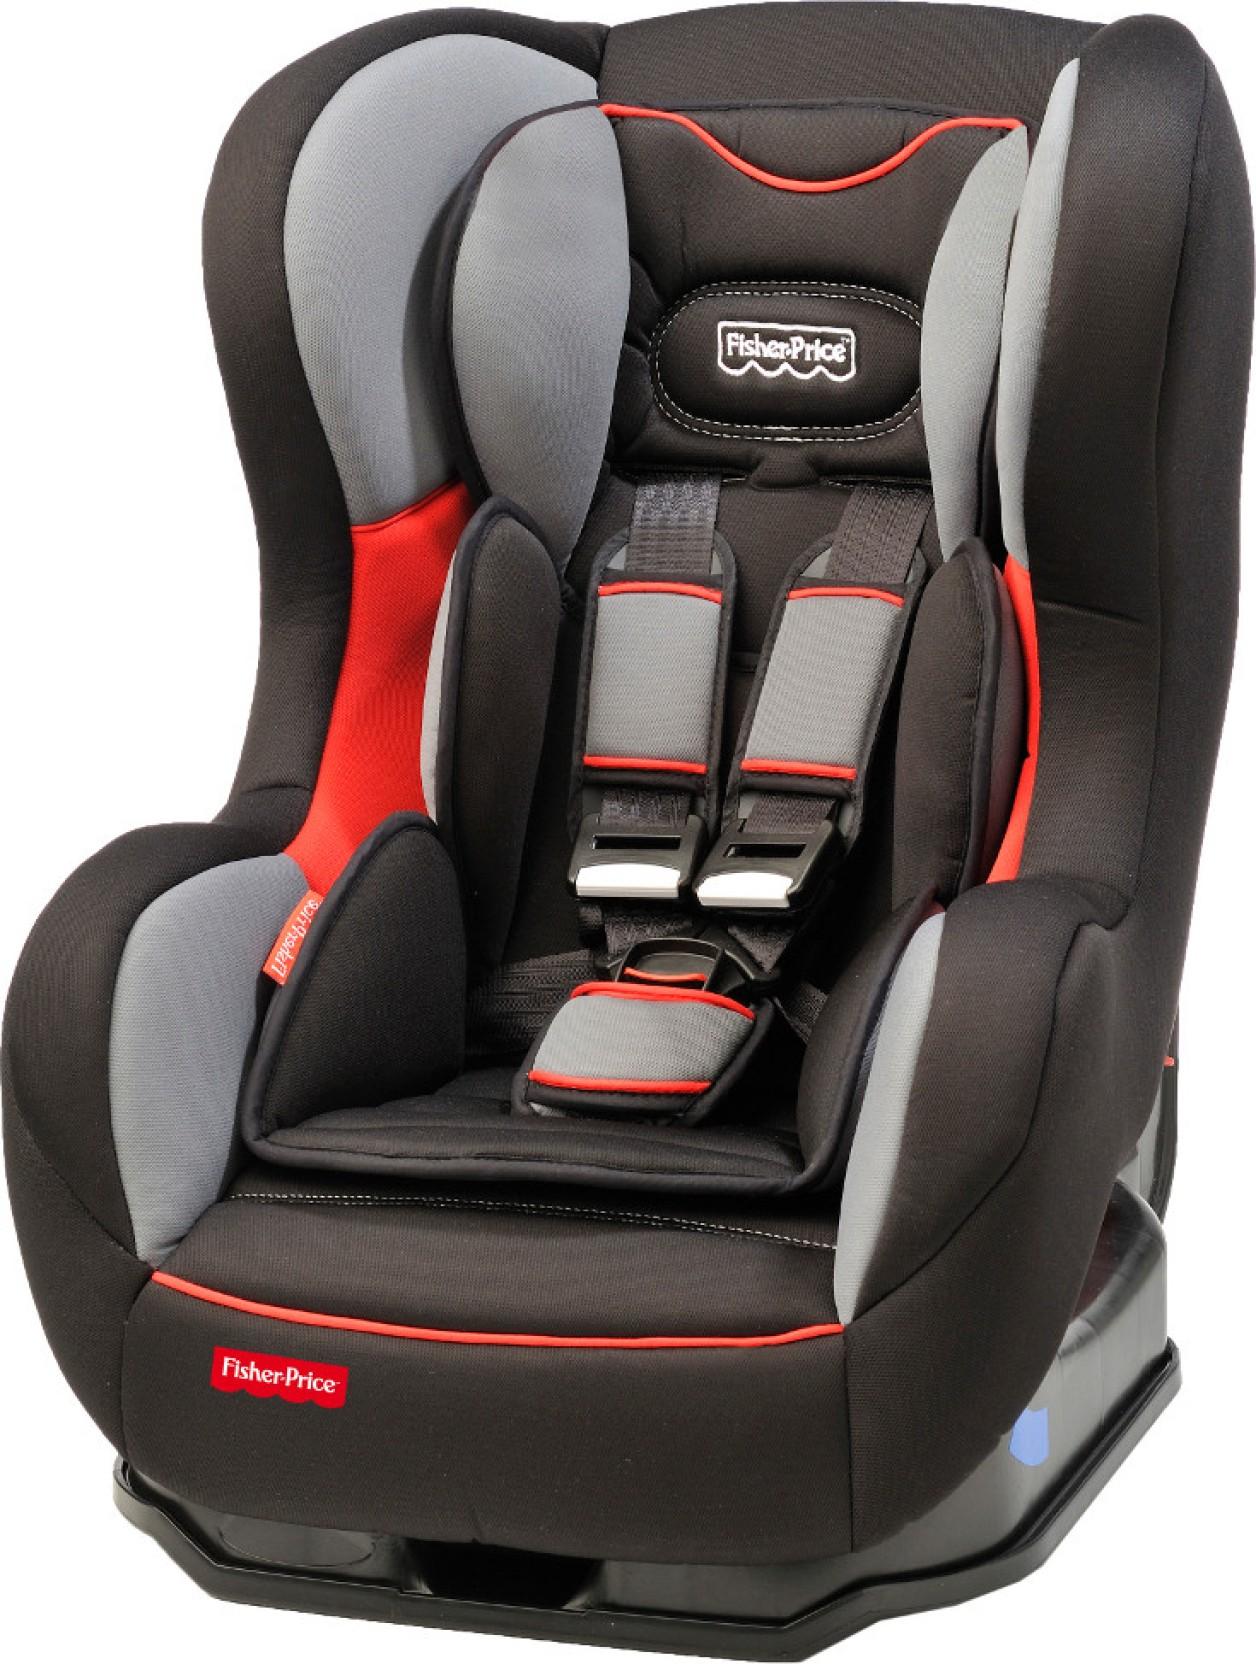 Fisher Price Car Seat Moonlight Forward Facing Share